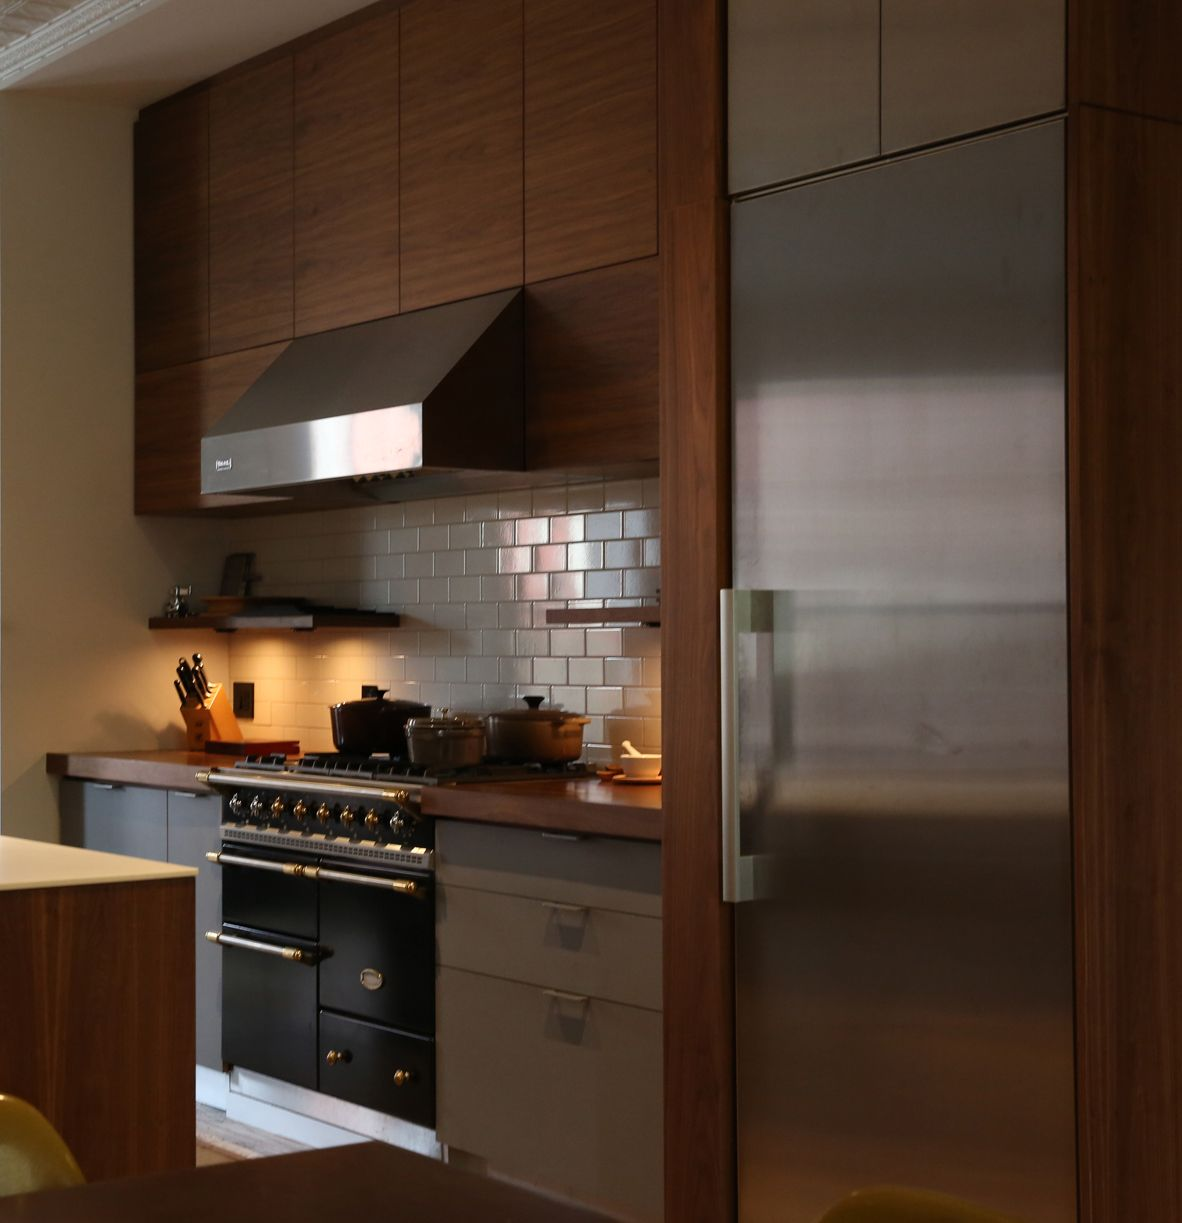 Location: Brooklyn, NY | Kitchen, Kitchen cabinets, Home decor